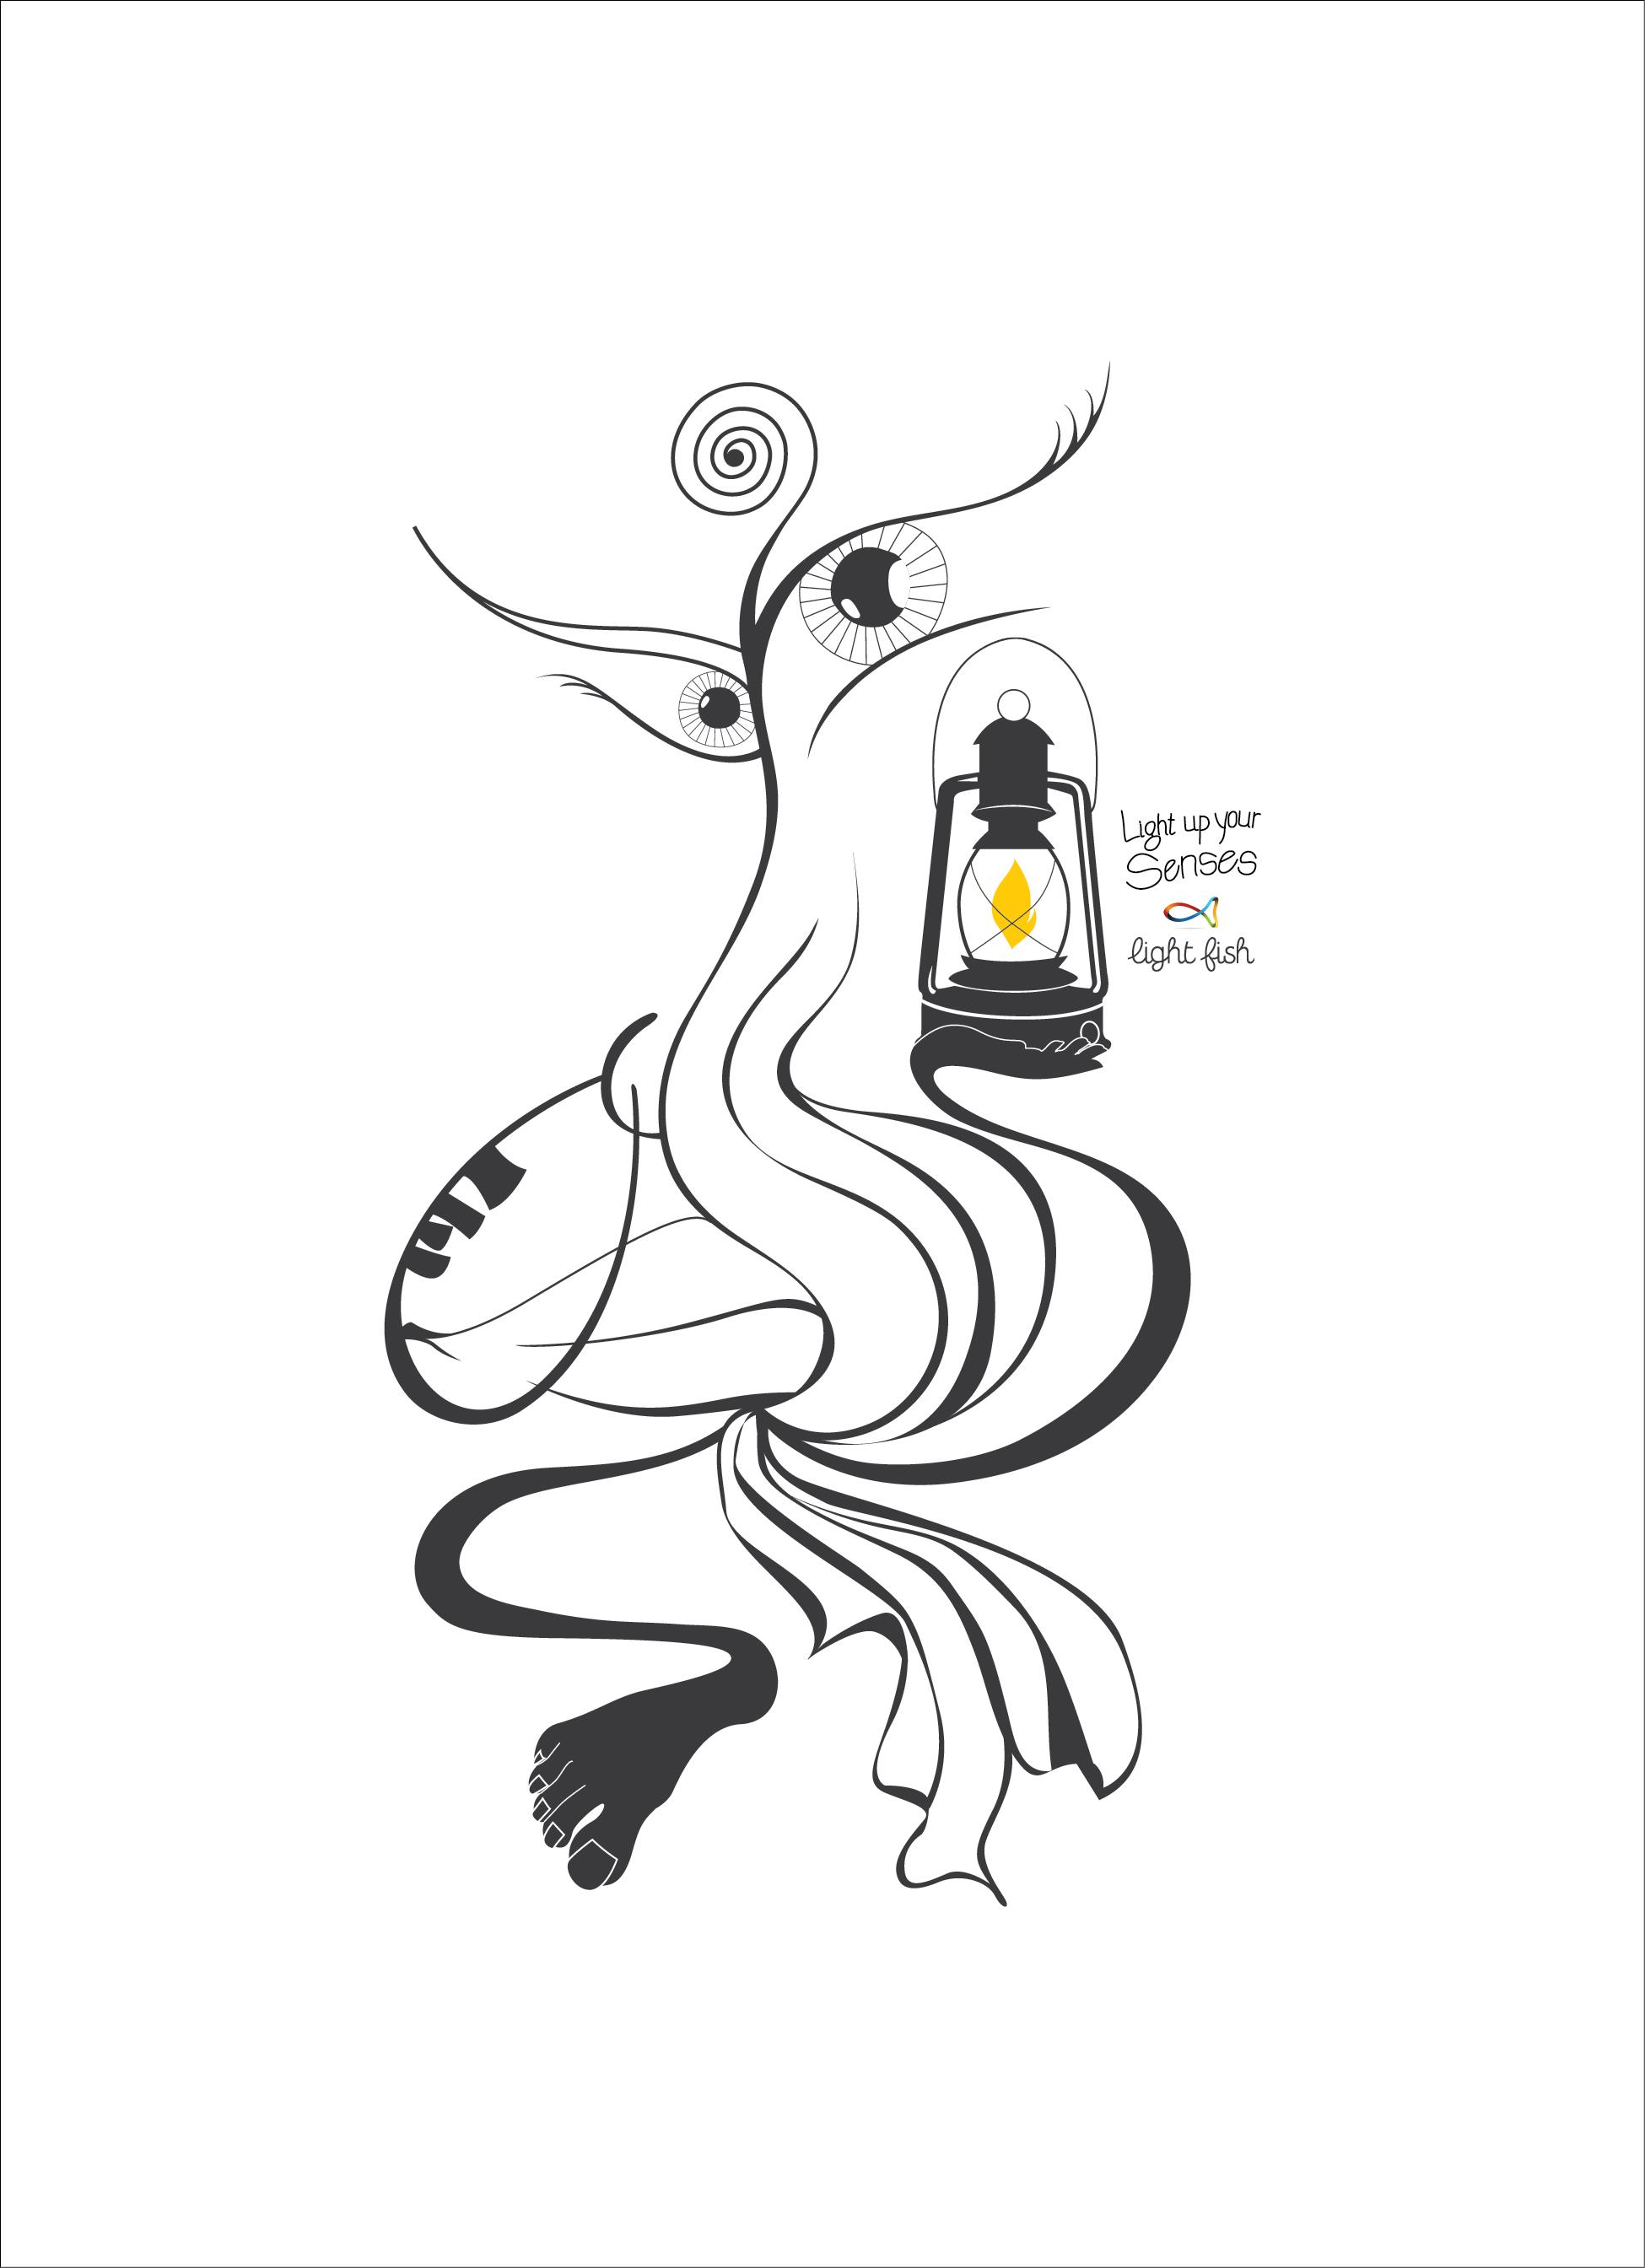 lightfish-lamps-light-up-your-senses-outdoor-print-381693-adeevee